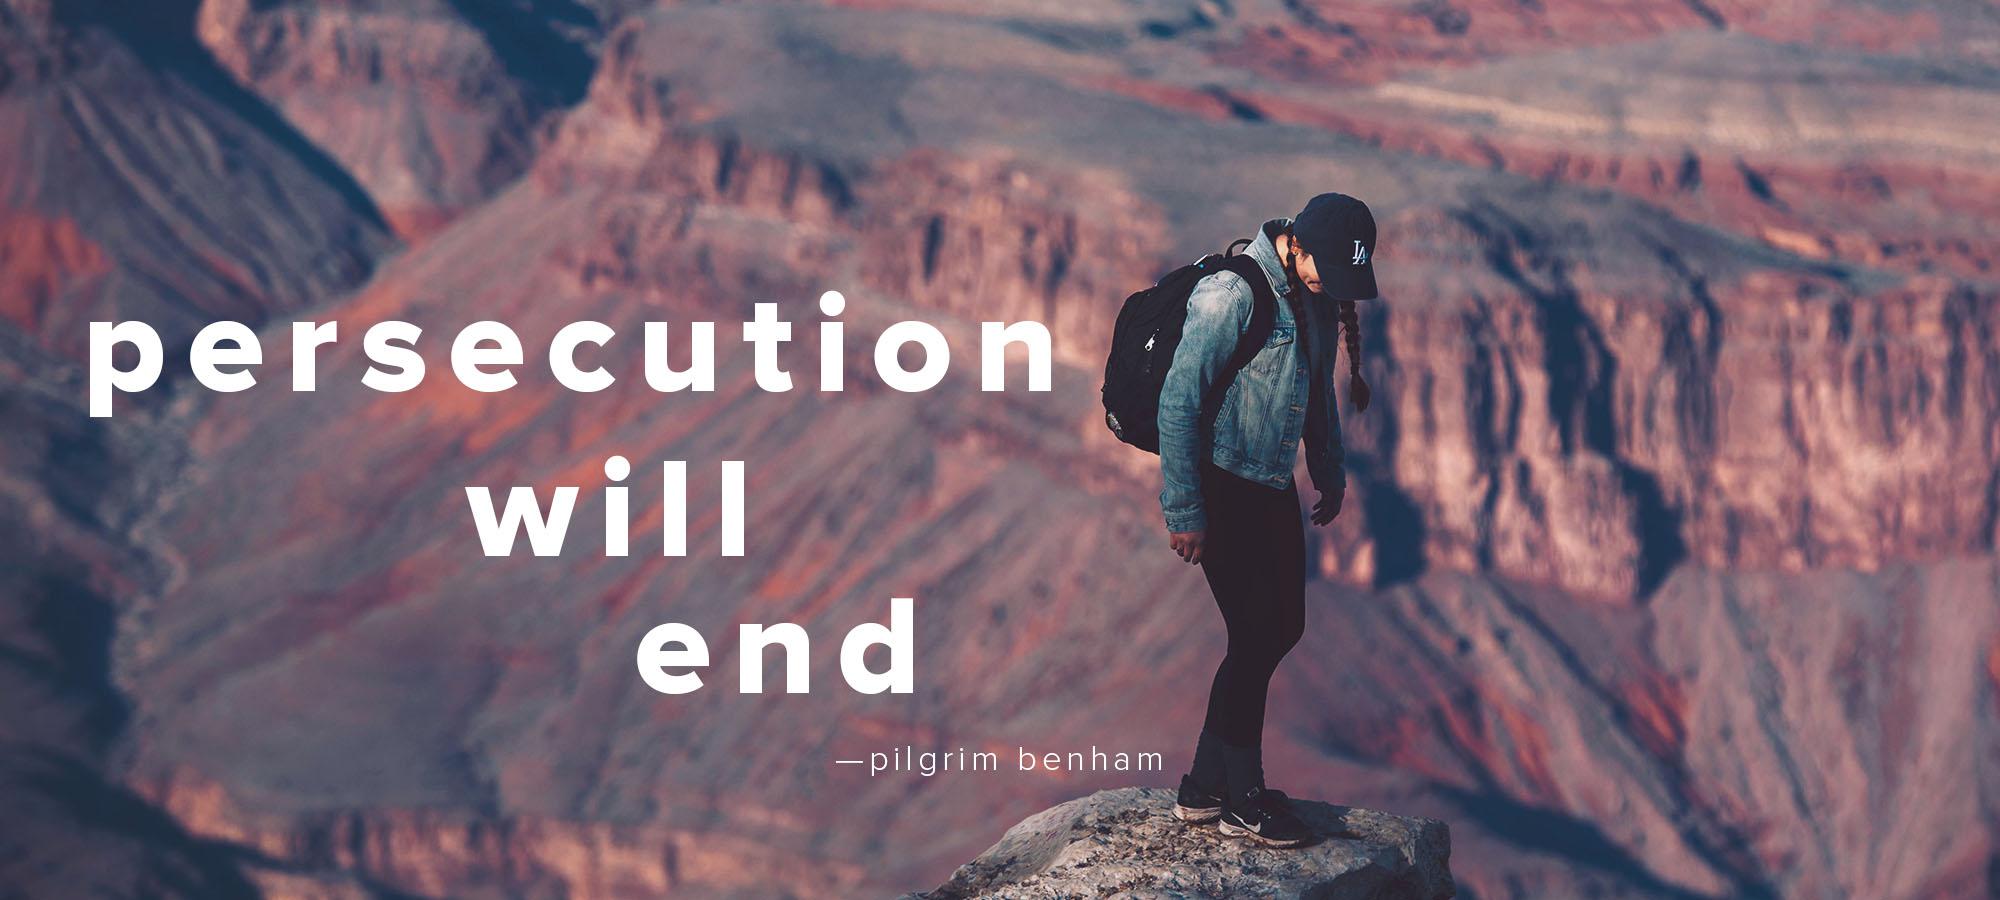 Pilgrim-Persecution-Will-End.jpg